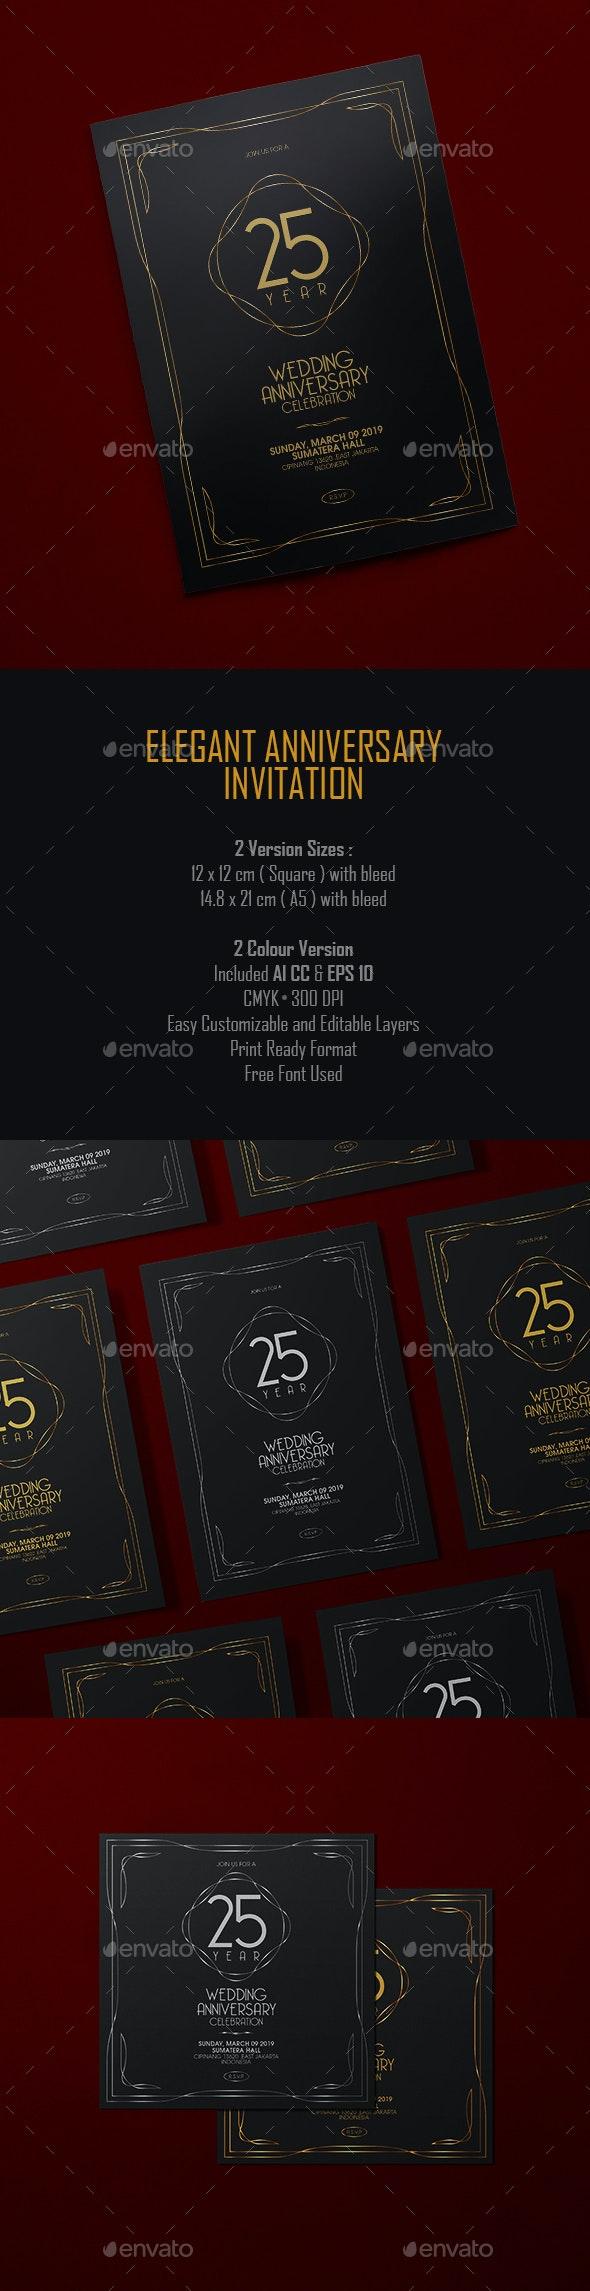 Elegant Anniversary Invitation - Anniversary Greeting Cards